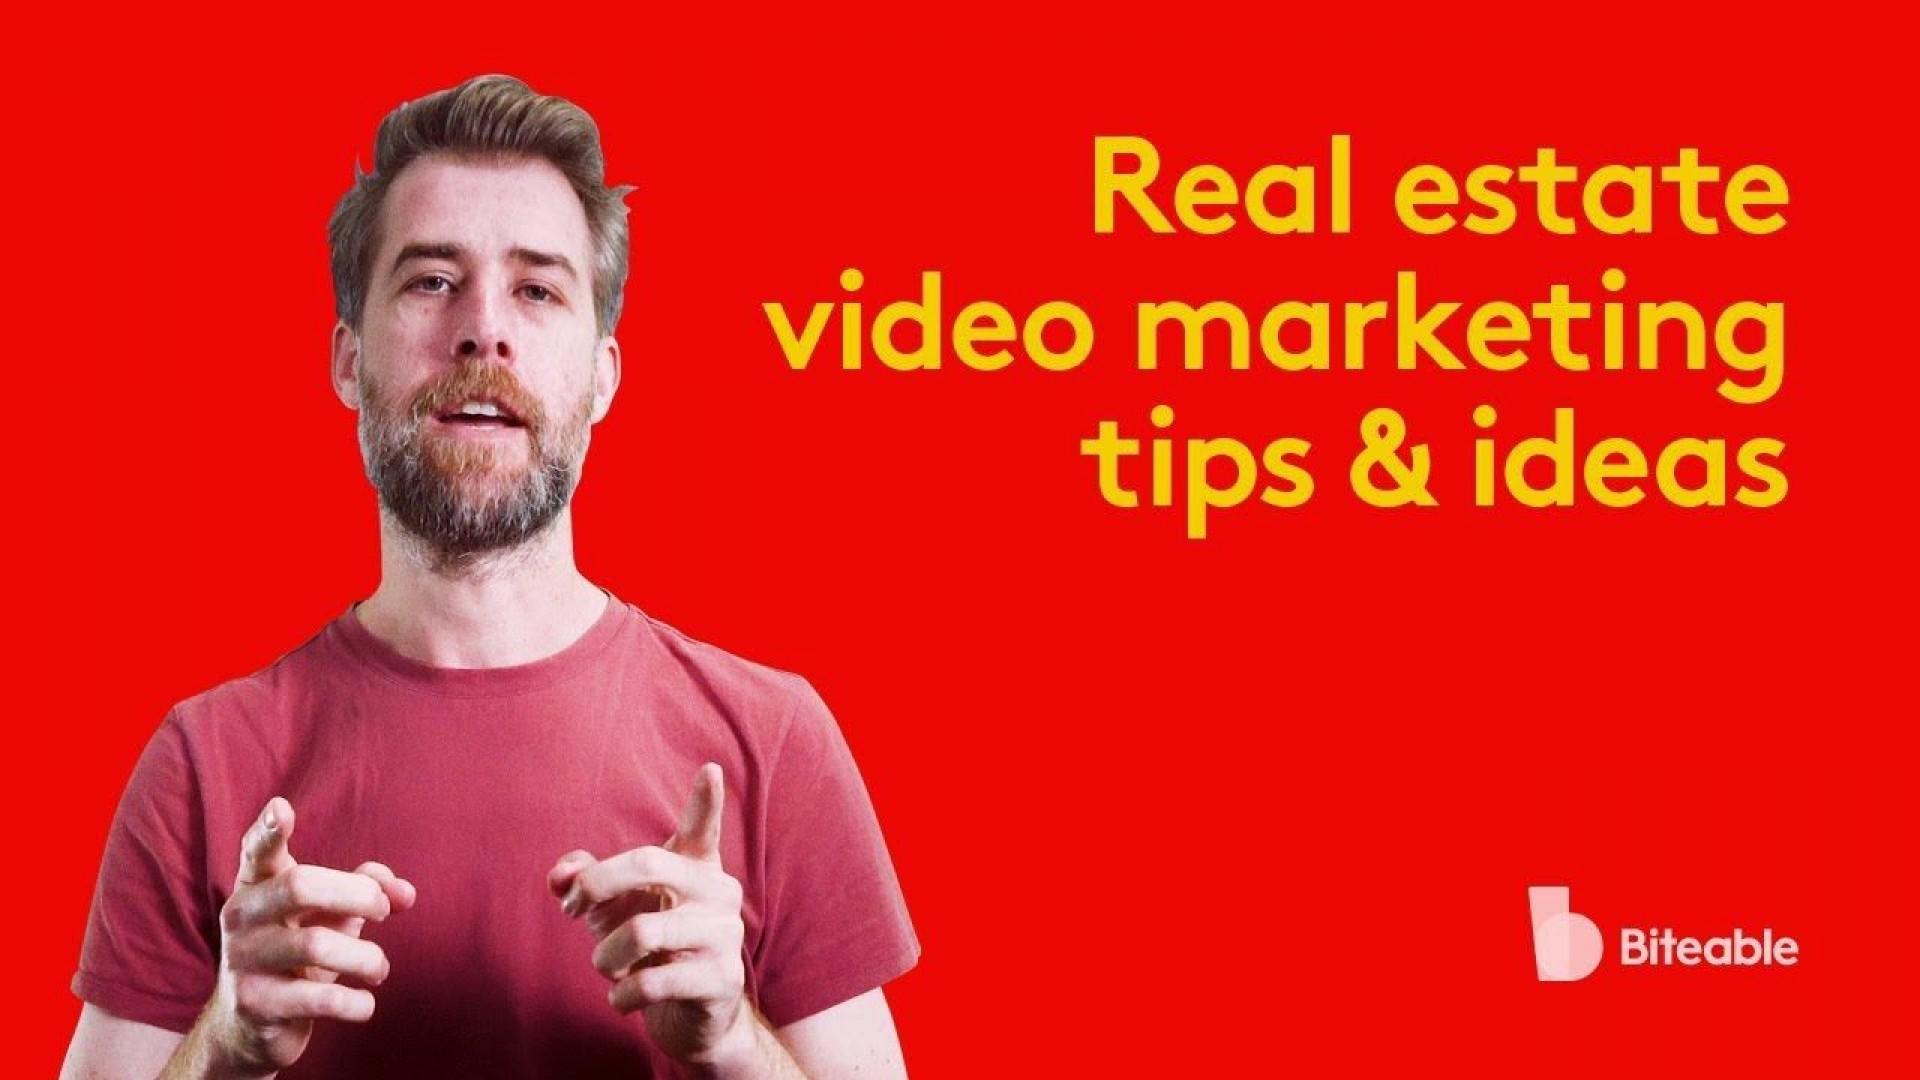 009 Awful Real Estate Marketing Video Template Idea  Templates1920